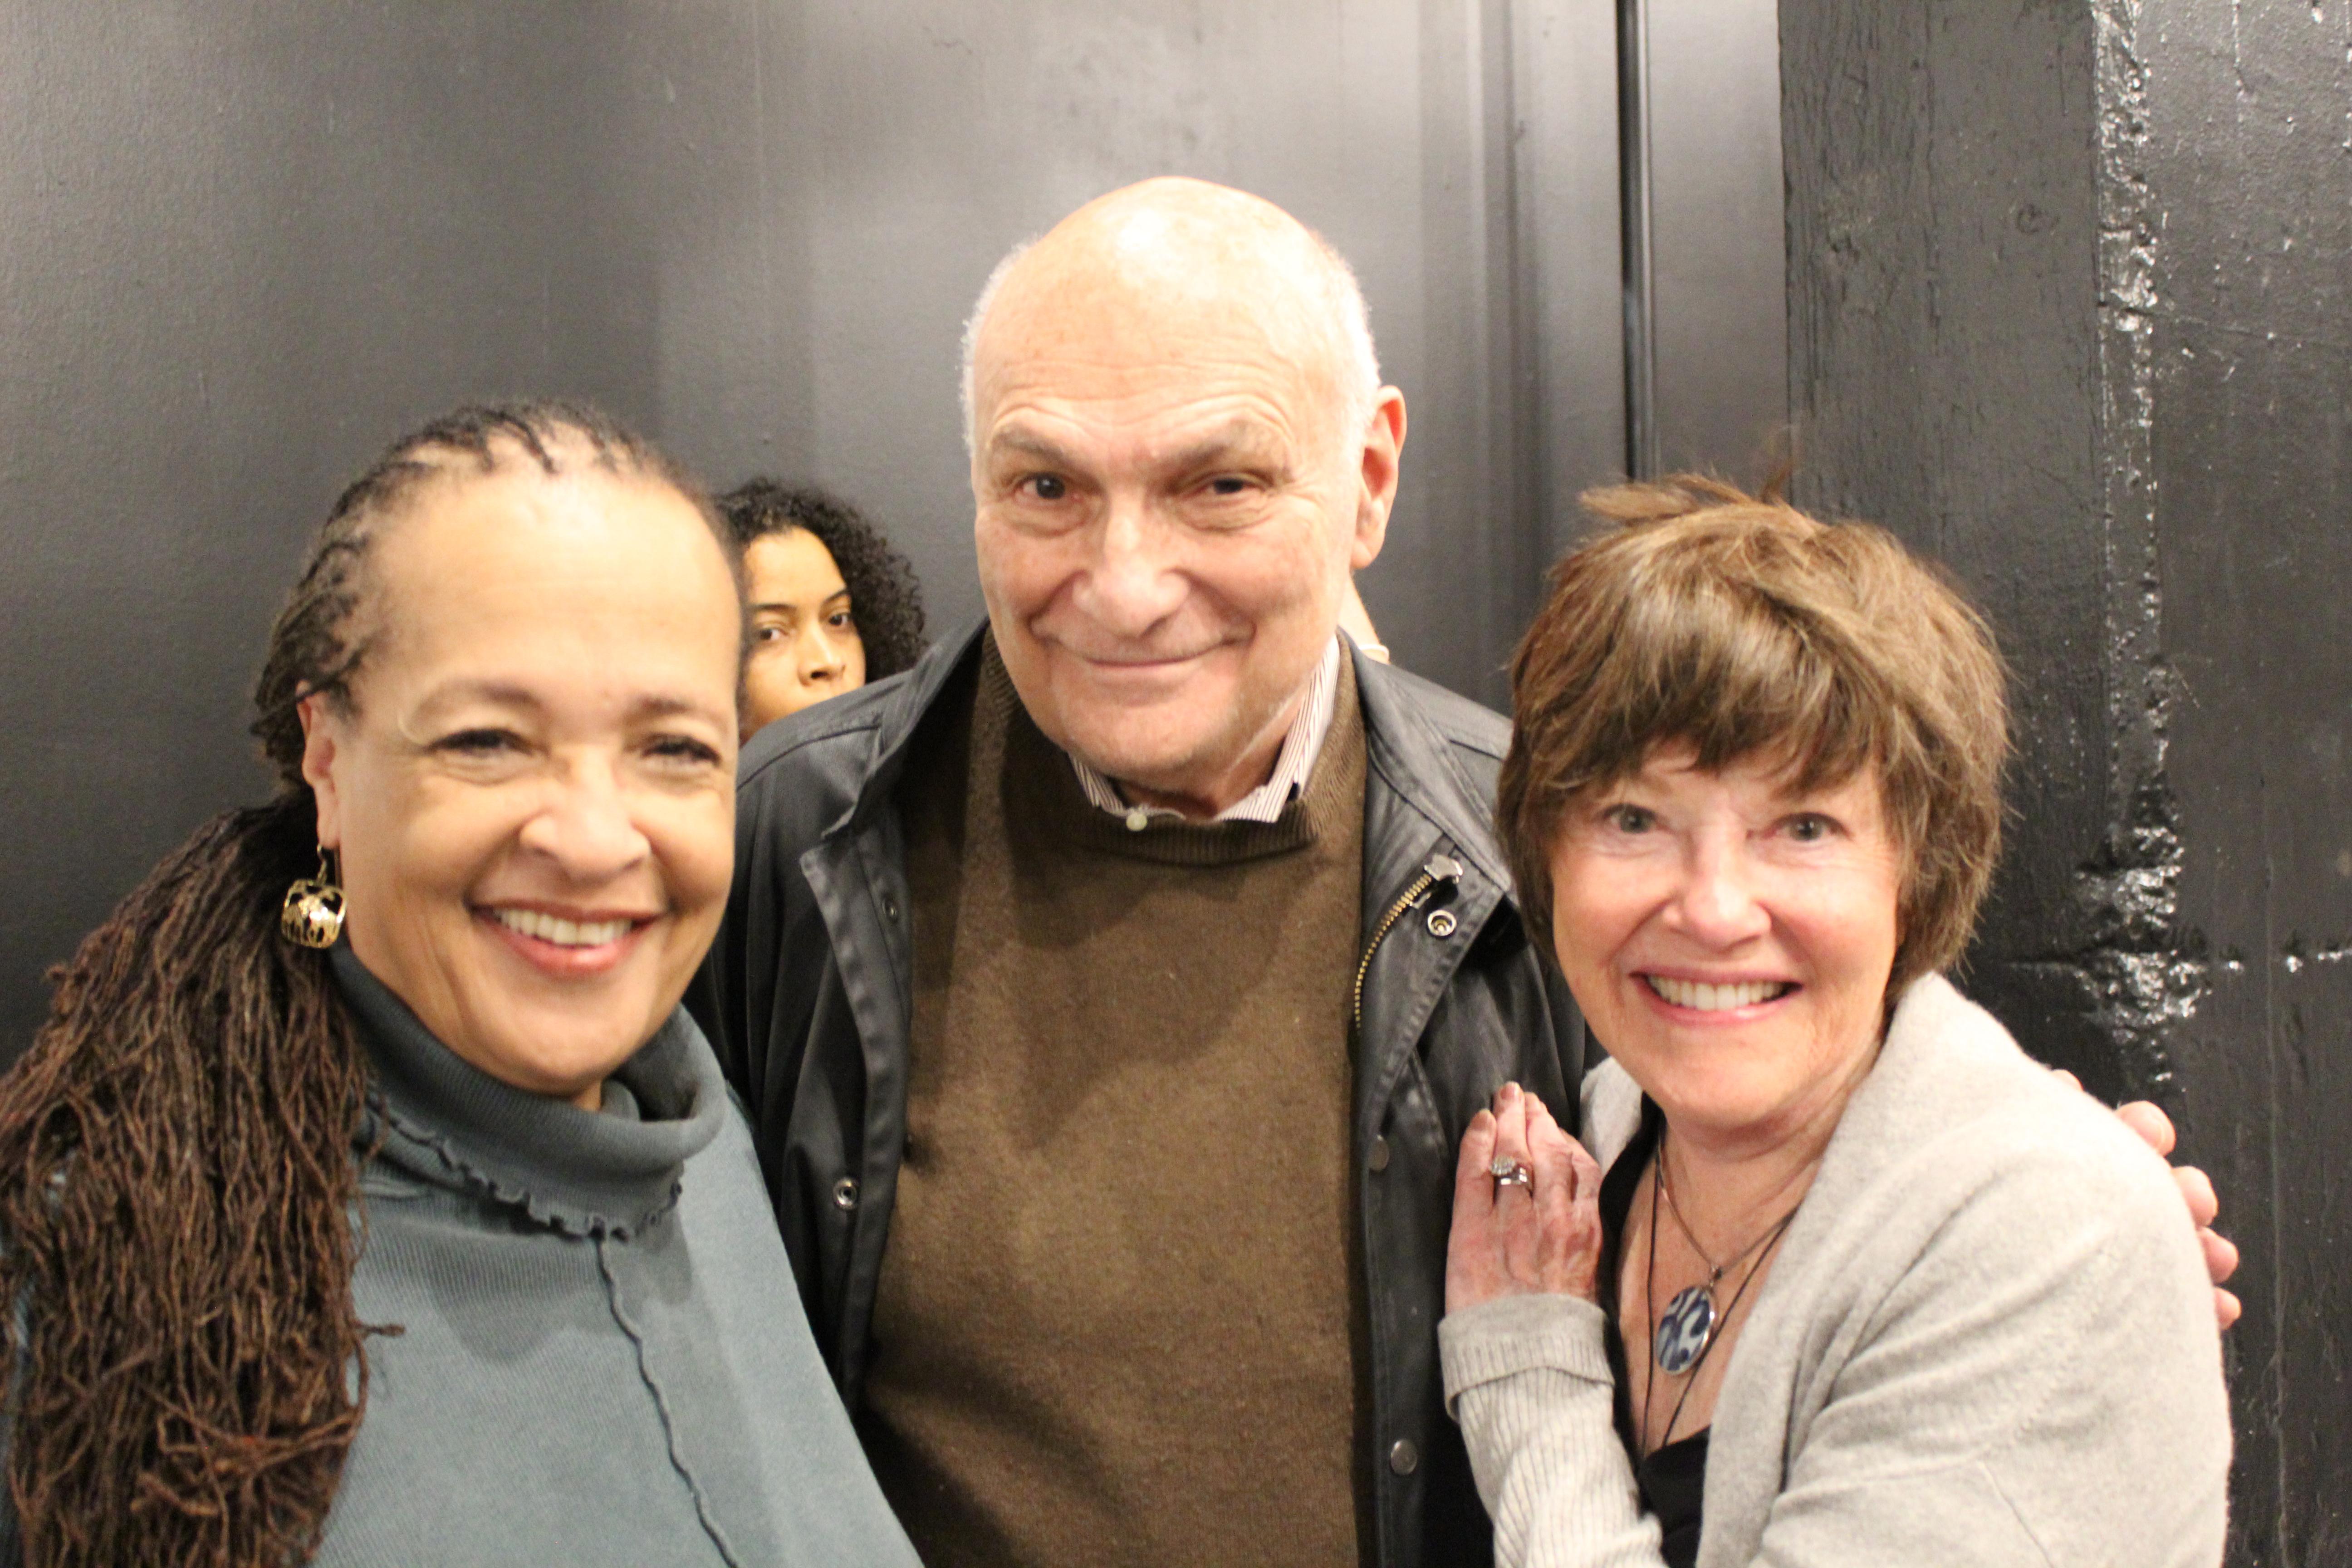 Photo of Franchelle Stewart Dorn (Chorus), Director Michael Kahn and Helen Carey (Chorus) in rehearsal for The Oresteia.